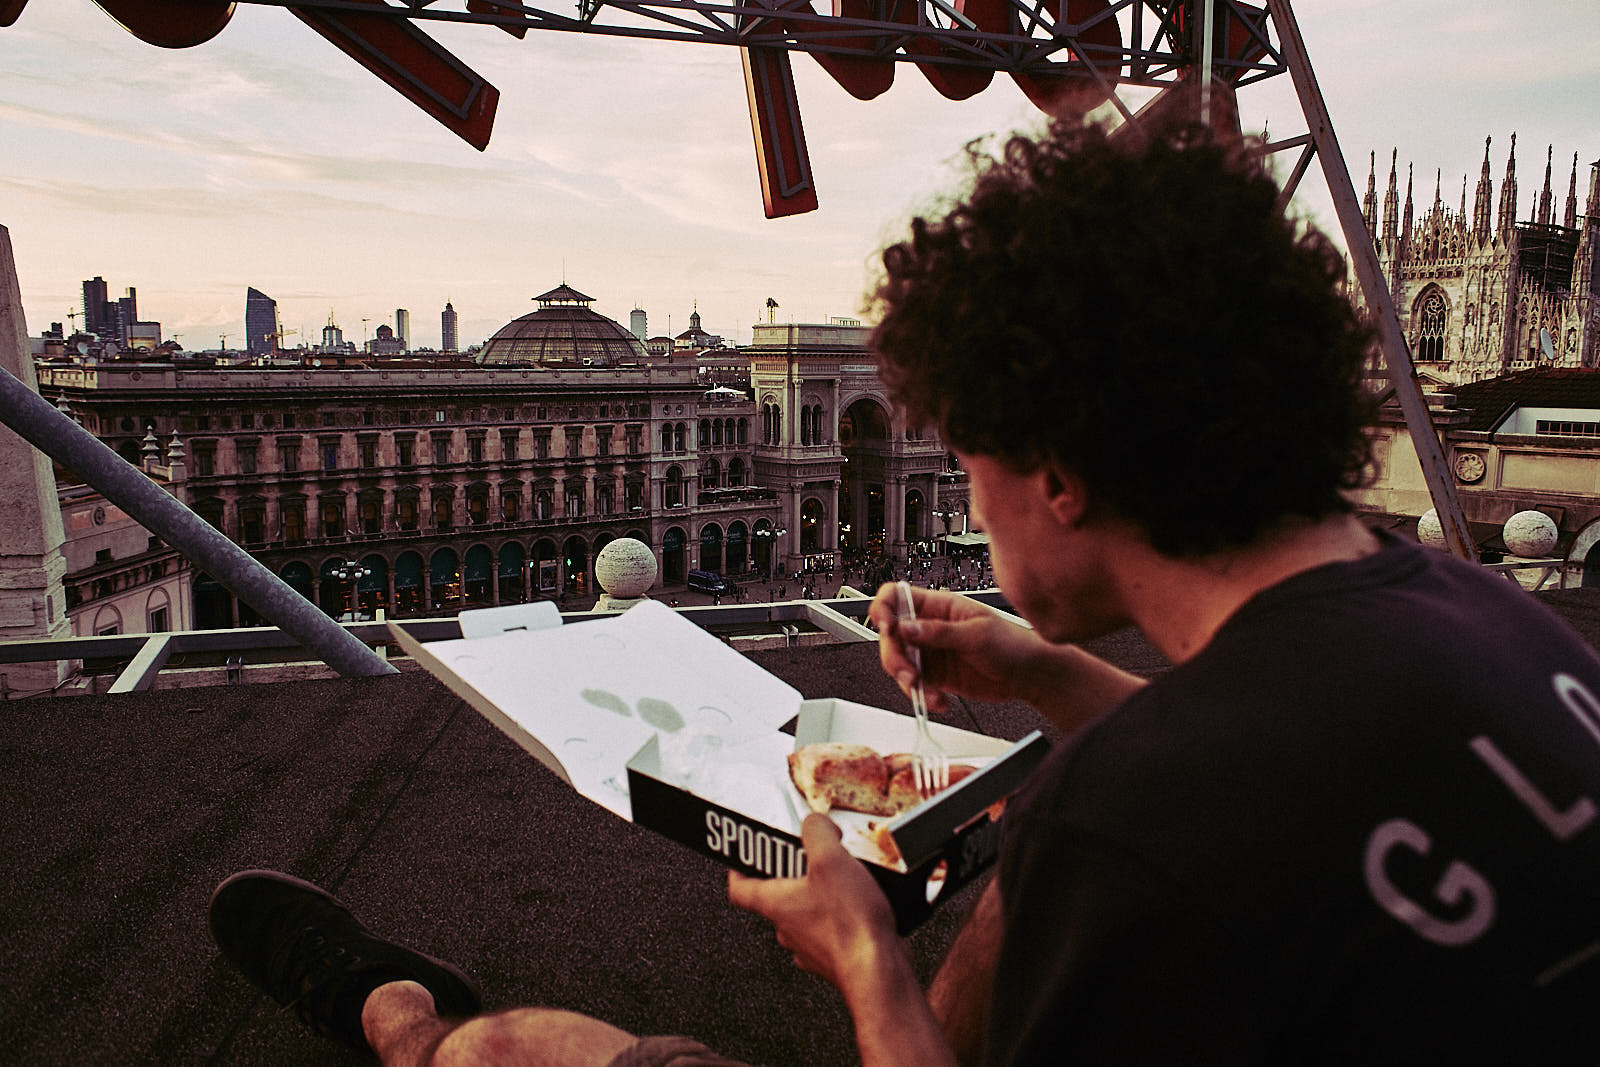 SkylineSeekers Marco Aurelio Media Eppol Milano   Collater.al 5